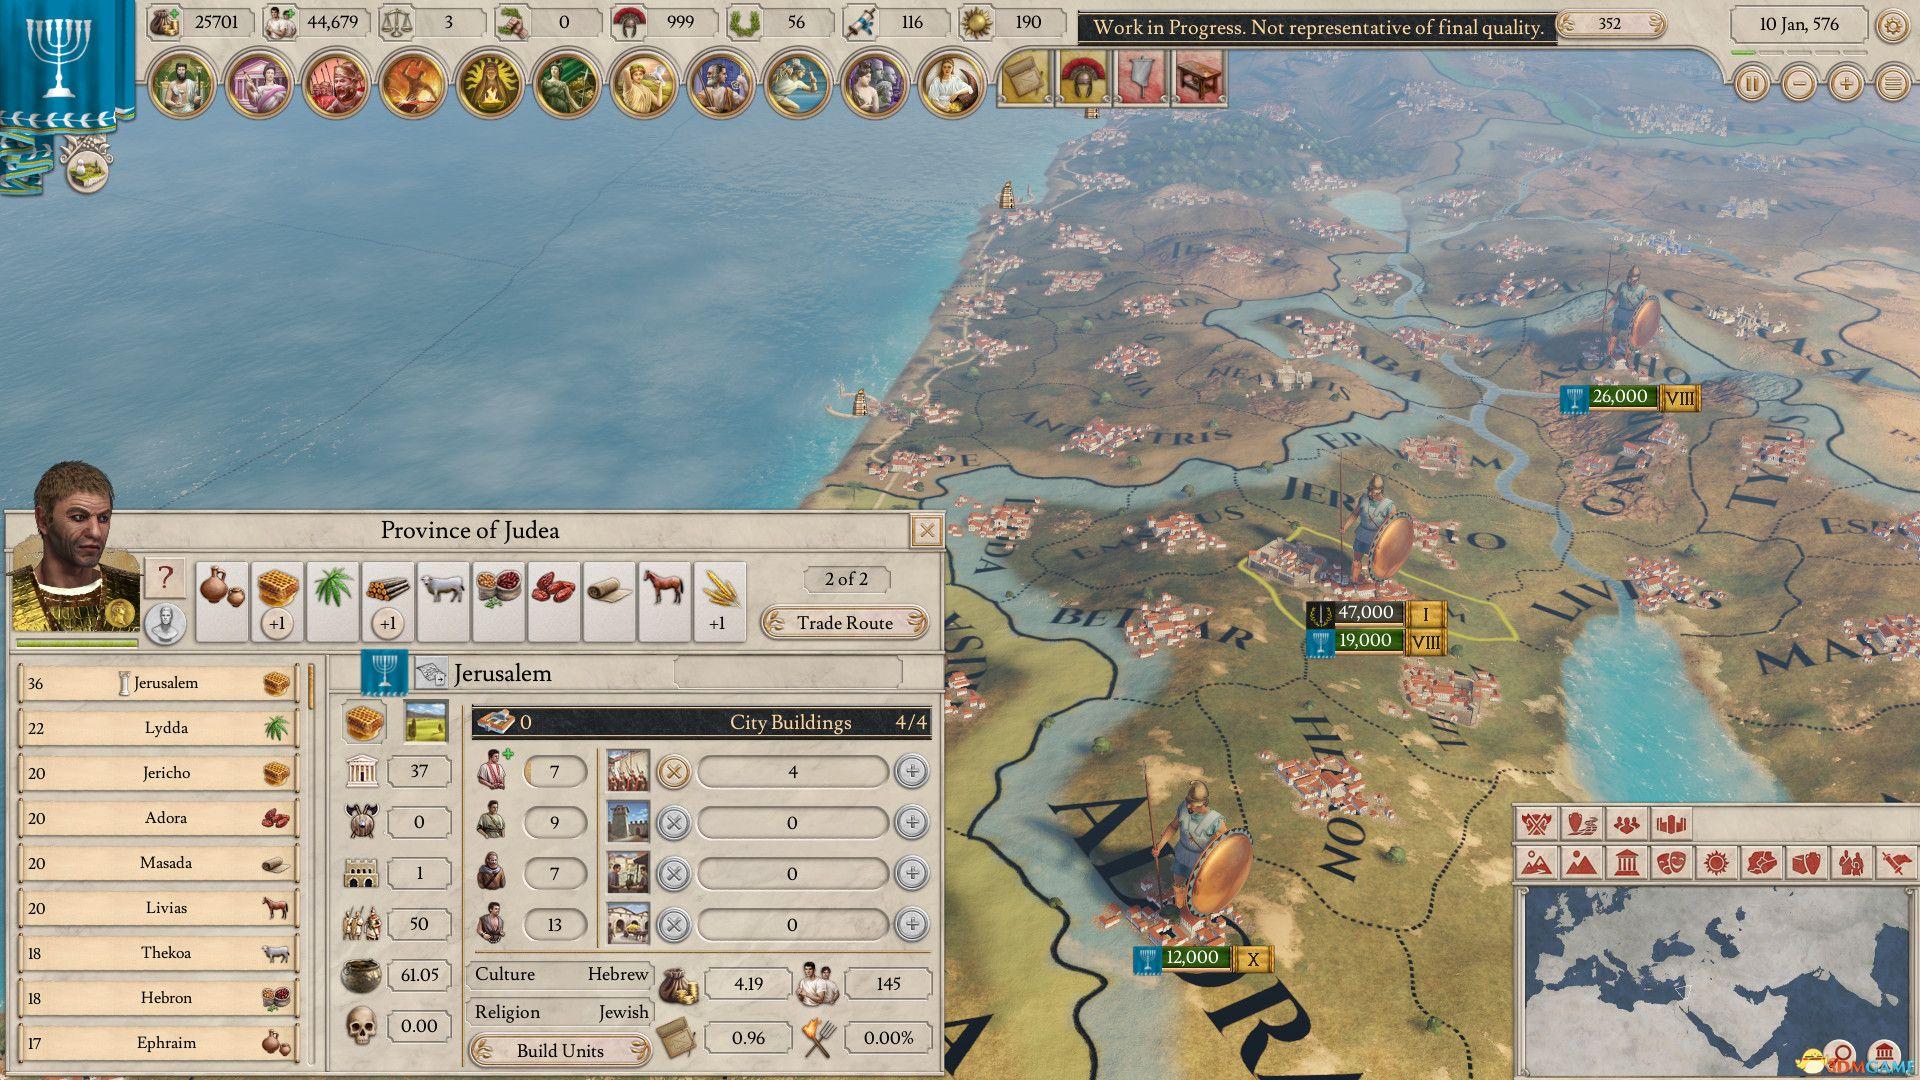 winxp电脑开机密码忘记了怎么办,策略游戏《大将军:罗马》官方中文PC豪华版下载